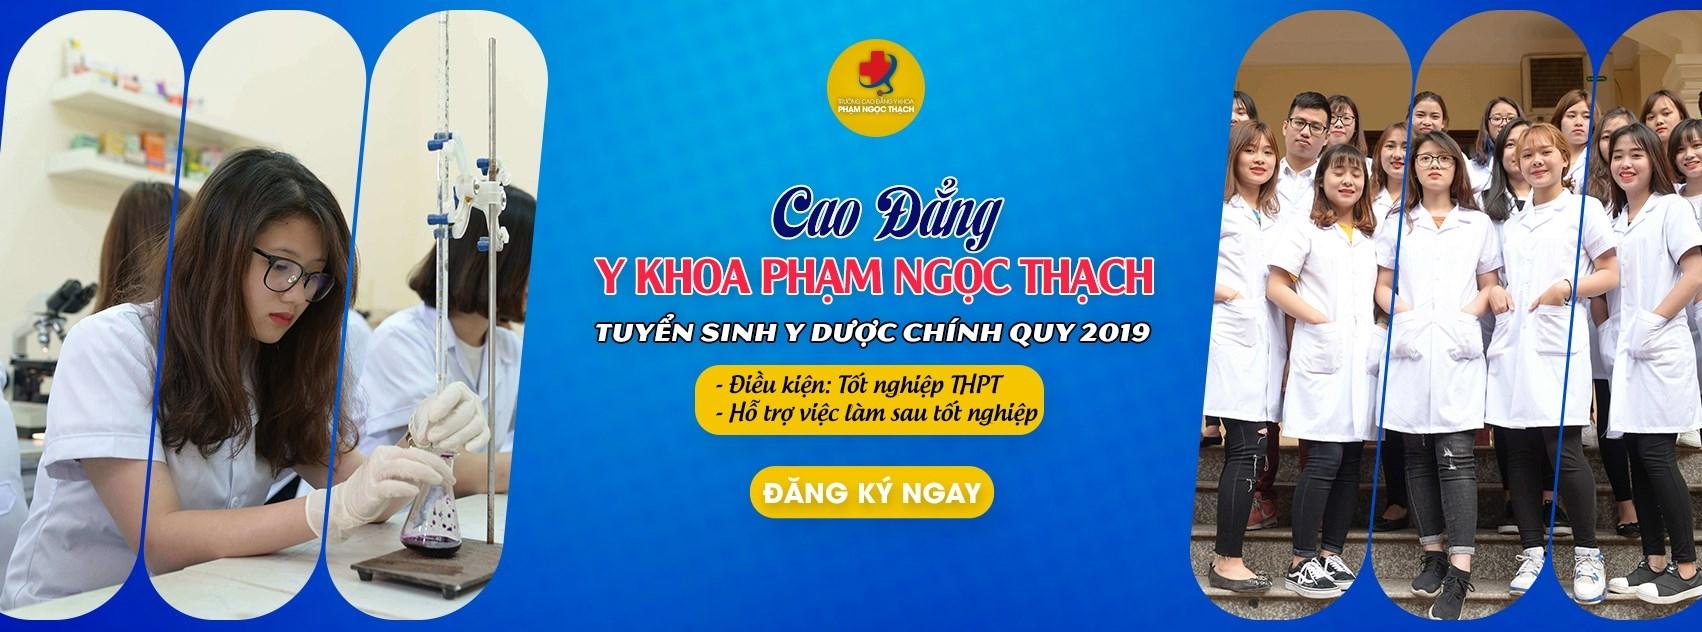 CD Y Khoa Pham Ngoc Thach (@cdykhoaphamngocthach) Cover Image